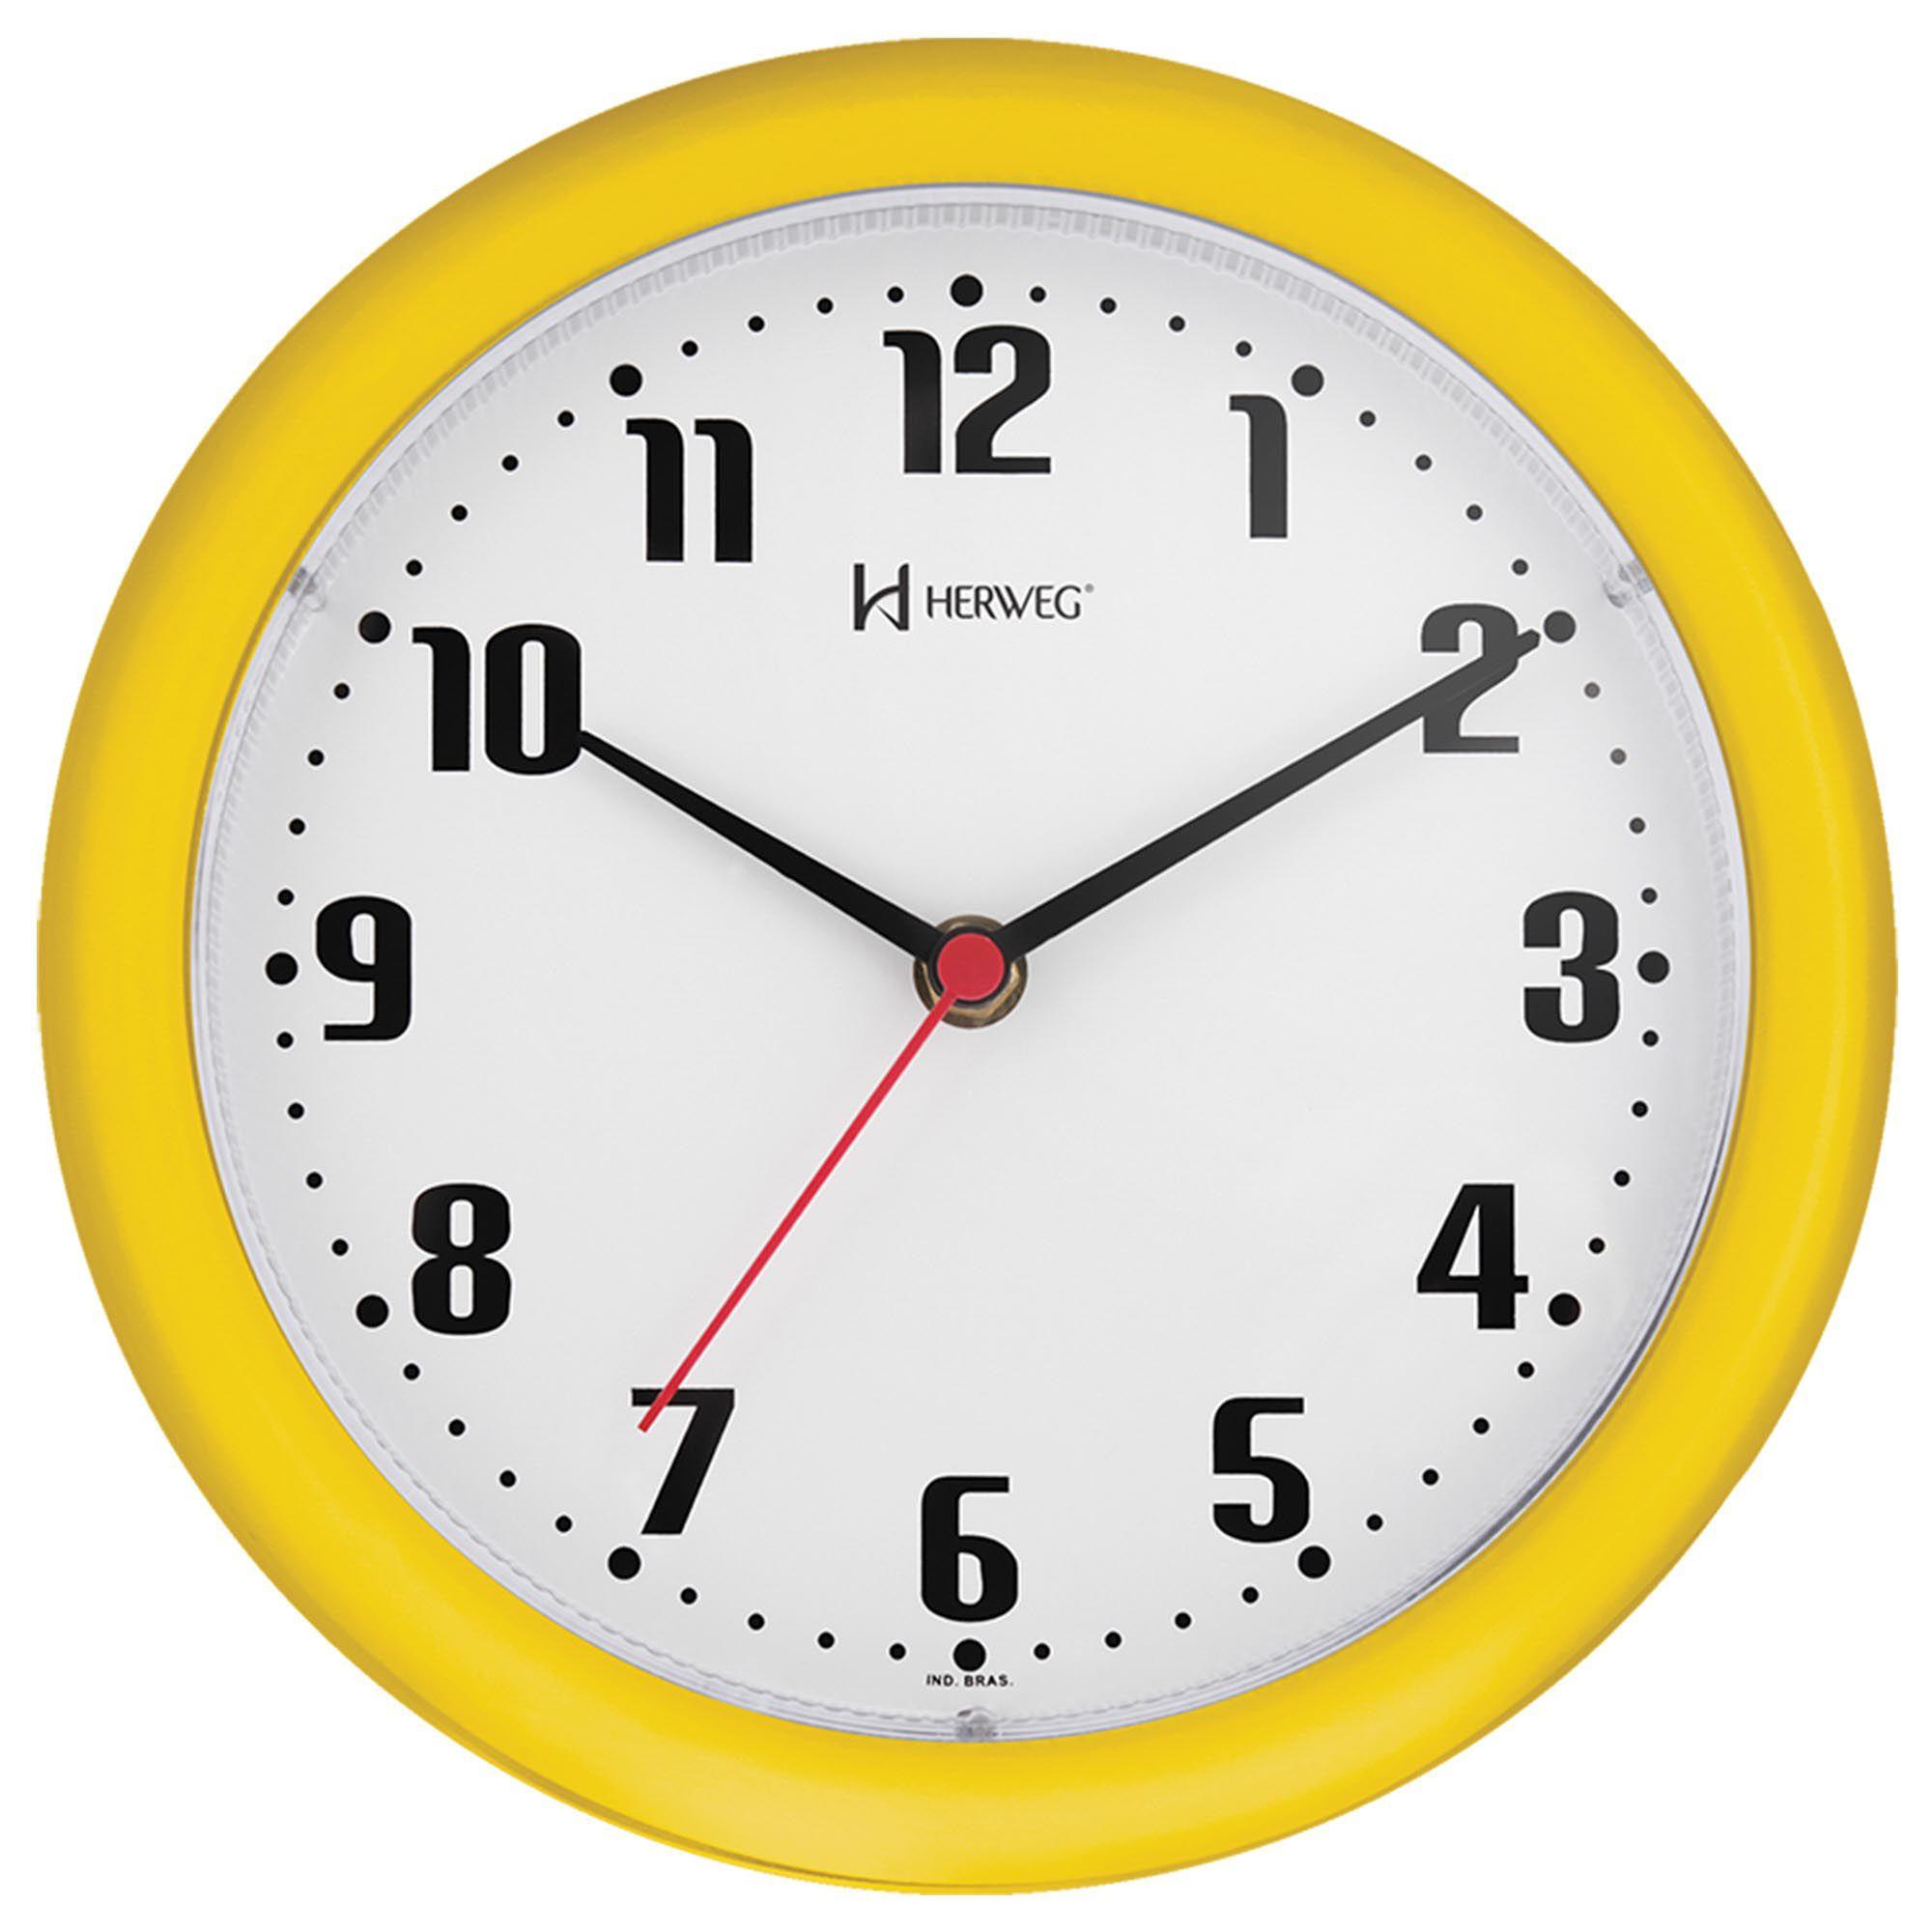 Relógio de Parede Analógico Herweg 6102 268 Amarelo Pantone